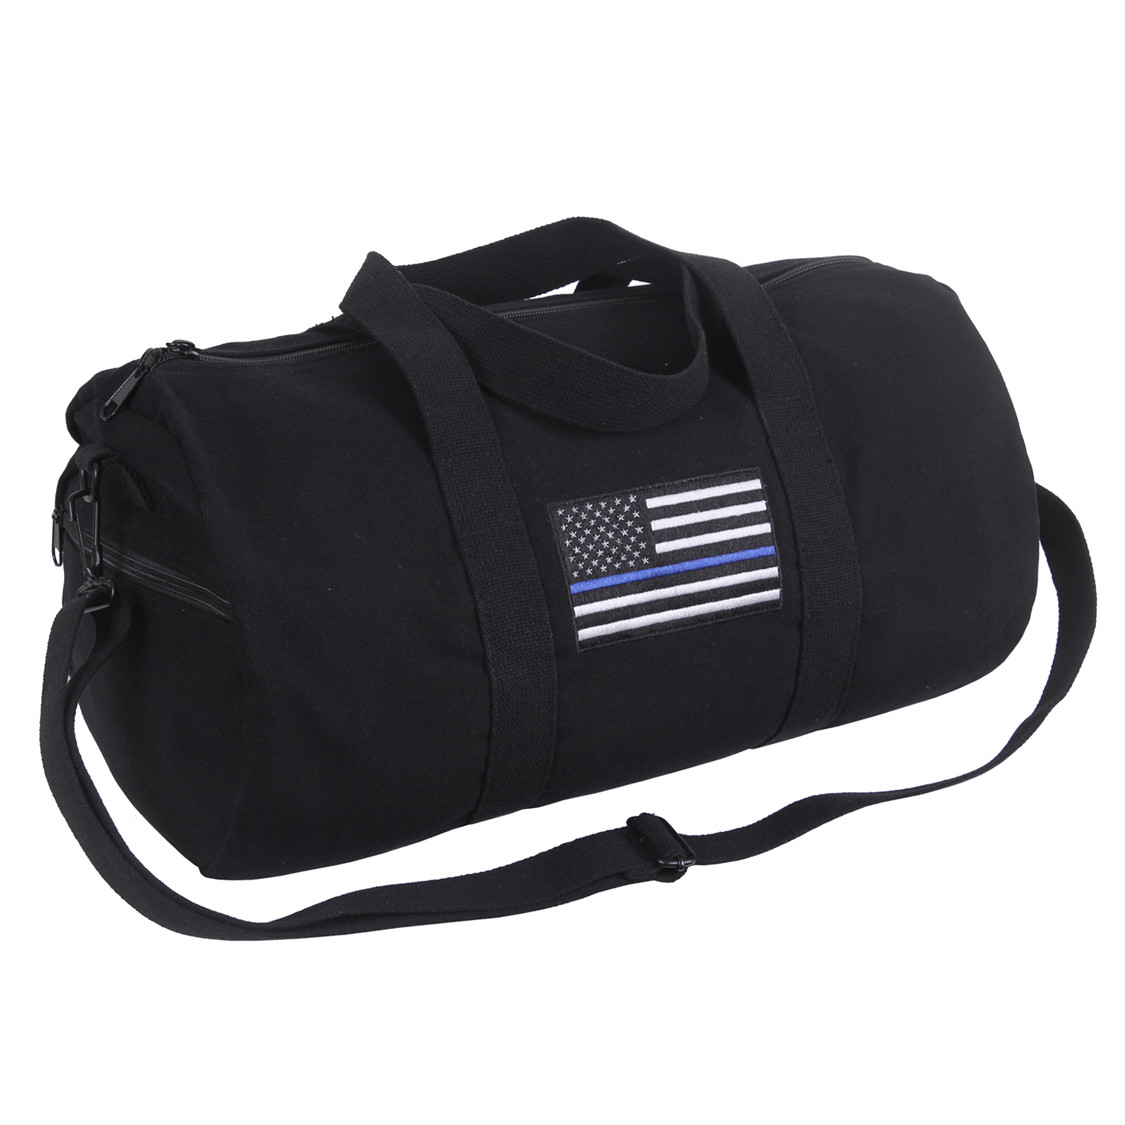 Shop Thin Blue Line Sports Bags - Fatigues Army Navy Gear 2baad69682e5